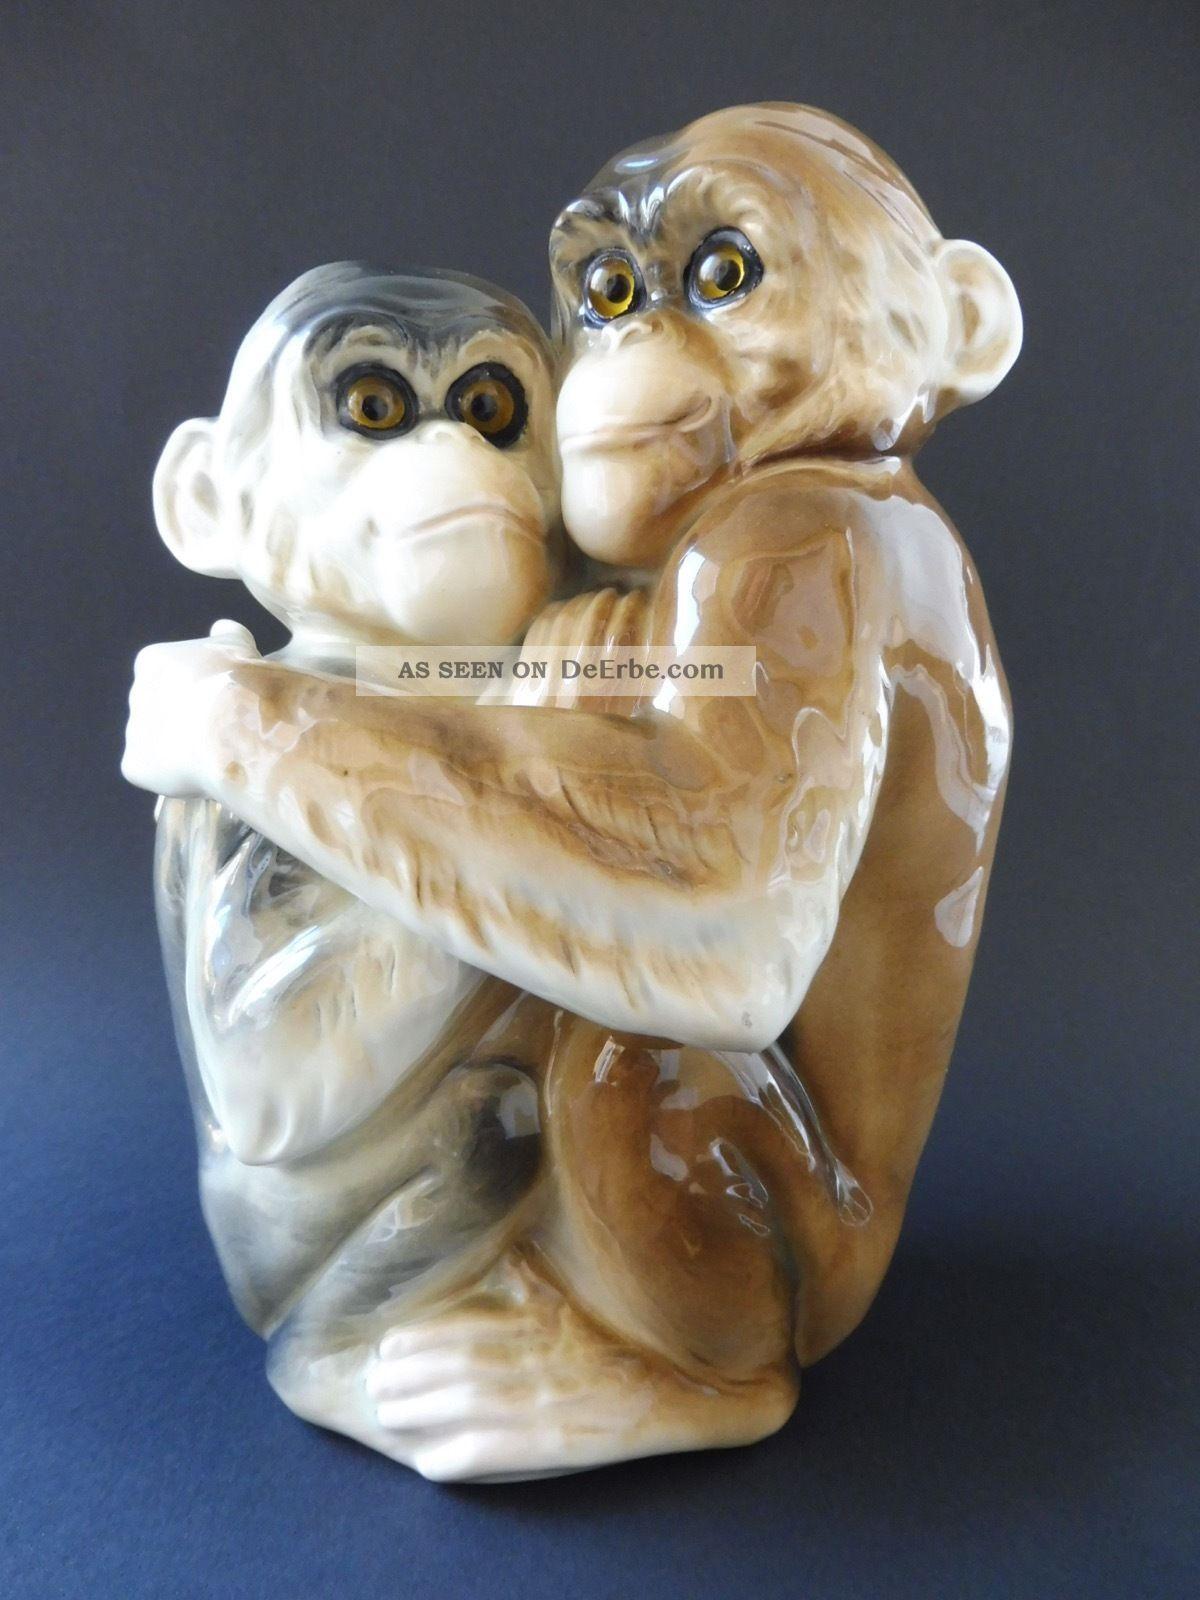 :: Rar Art Deco Affe Ape Porzellan Neapel Lampe Lamp Chimp Schimpanse Porcelain 1920-1949, Art Déco Bild